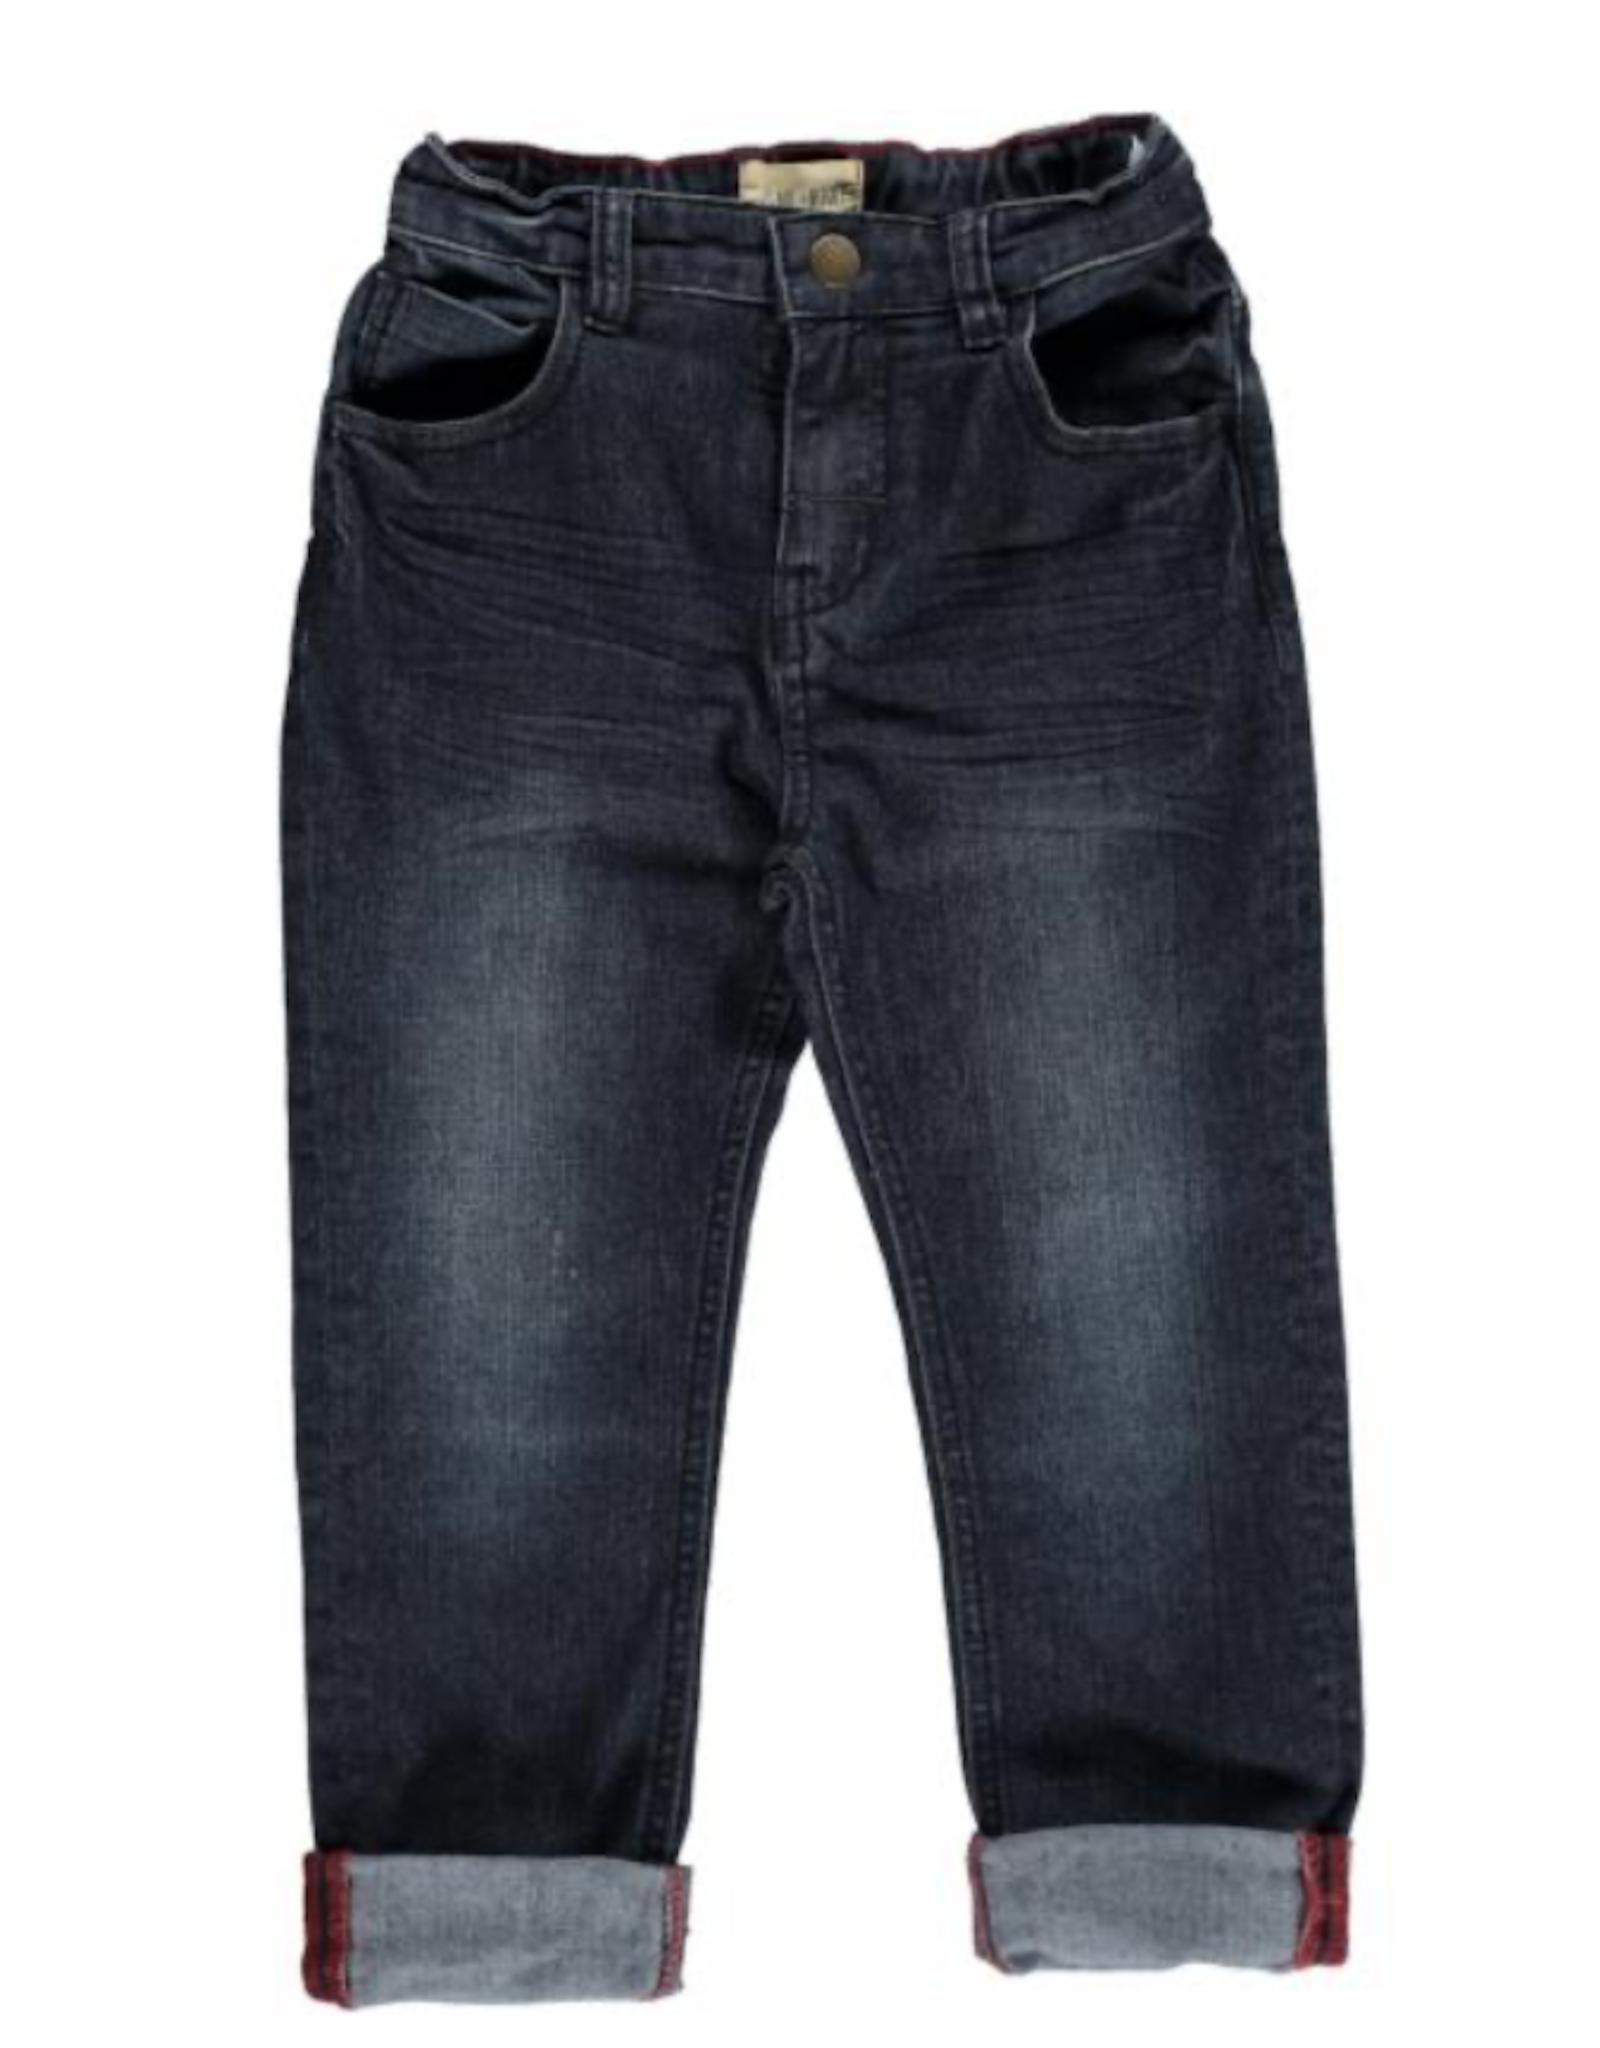 Me & Henry jeans- blue